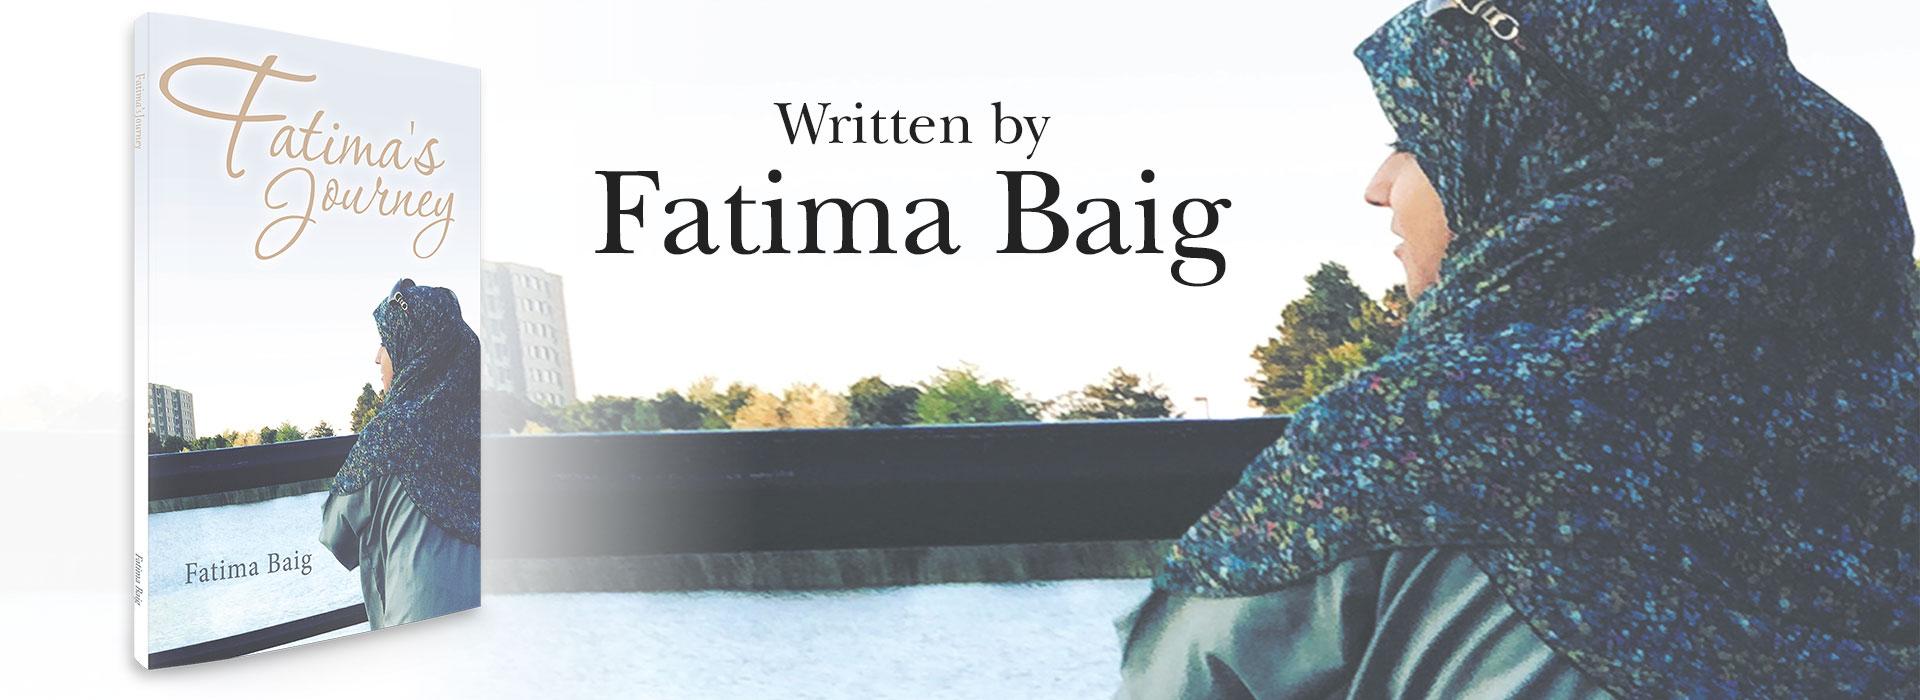 http://www.fatimabaig.com/wp-content/uploads/2018/06/Banner-B-L2.jpg